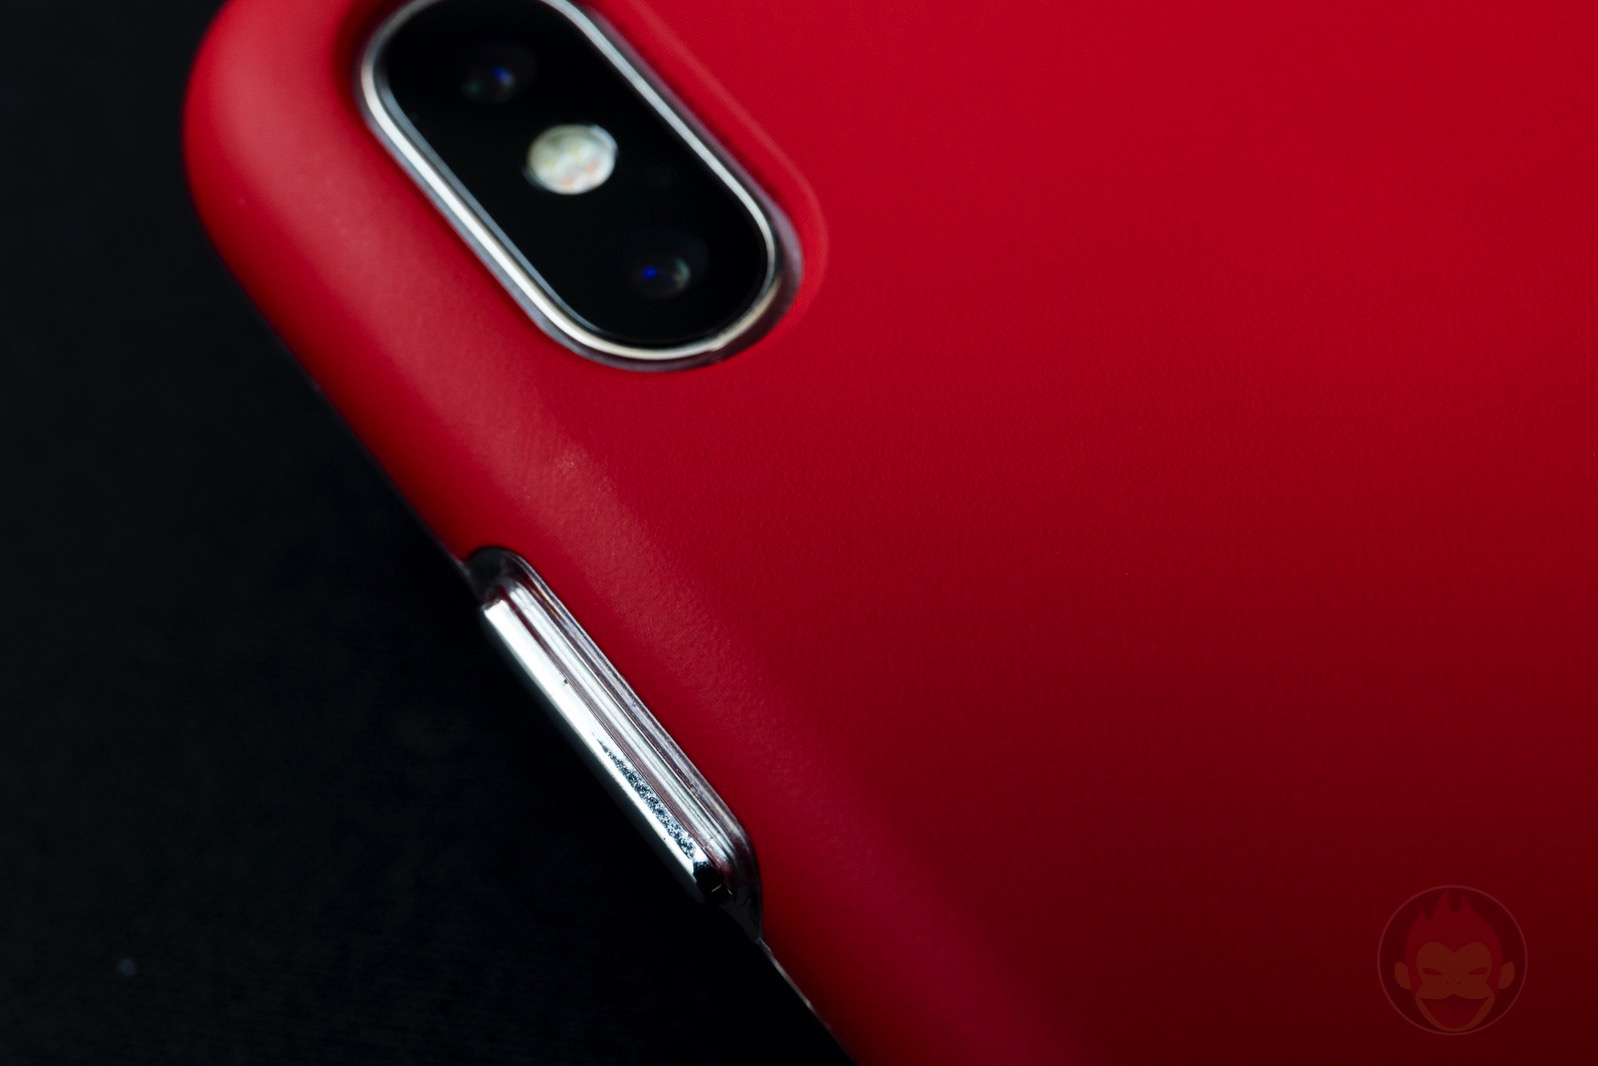 PhoneFoam-Dual-Skin-iPhoneX-Case-02.jpg